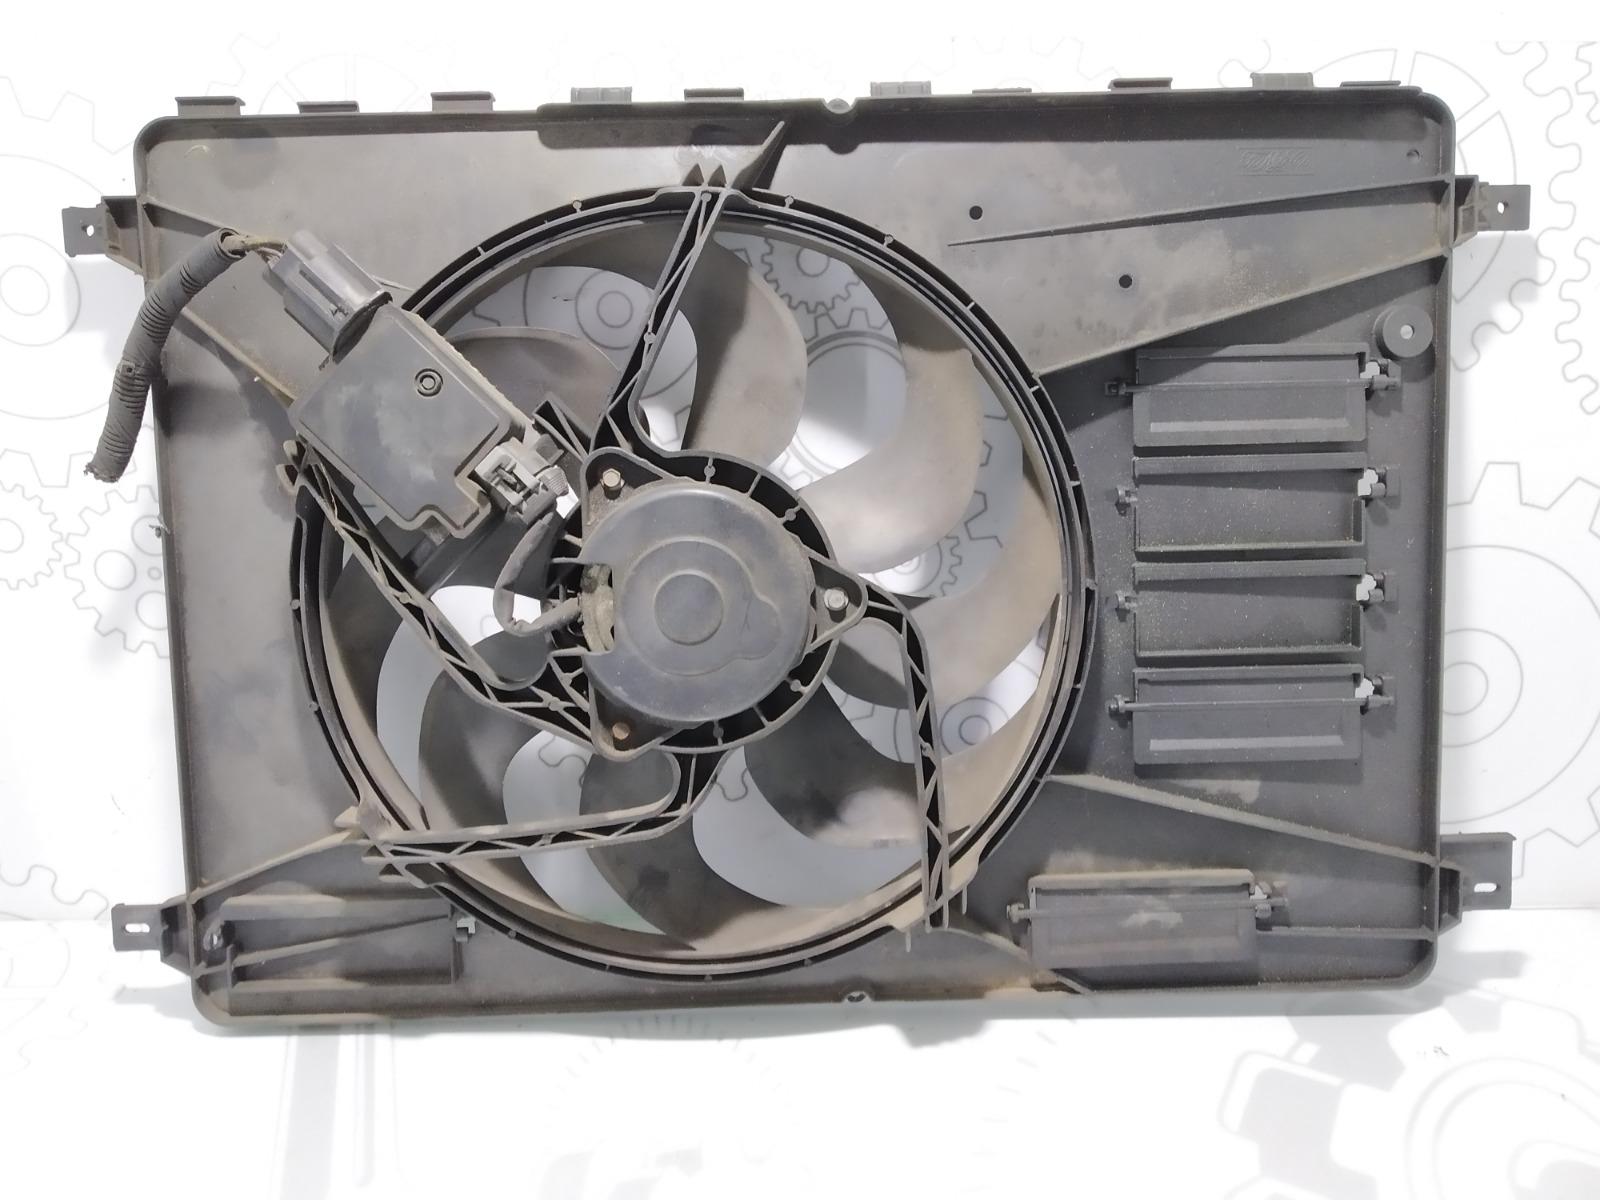 Вентилятор радиатора Ford Mondeo 2.0 TDCI 2007 (б/у)